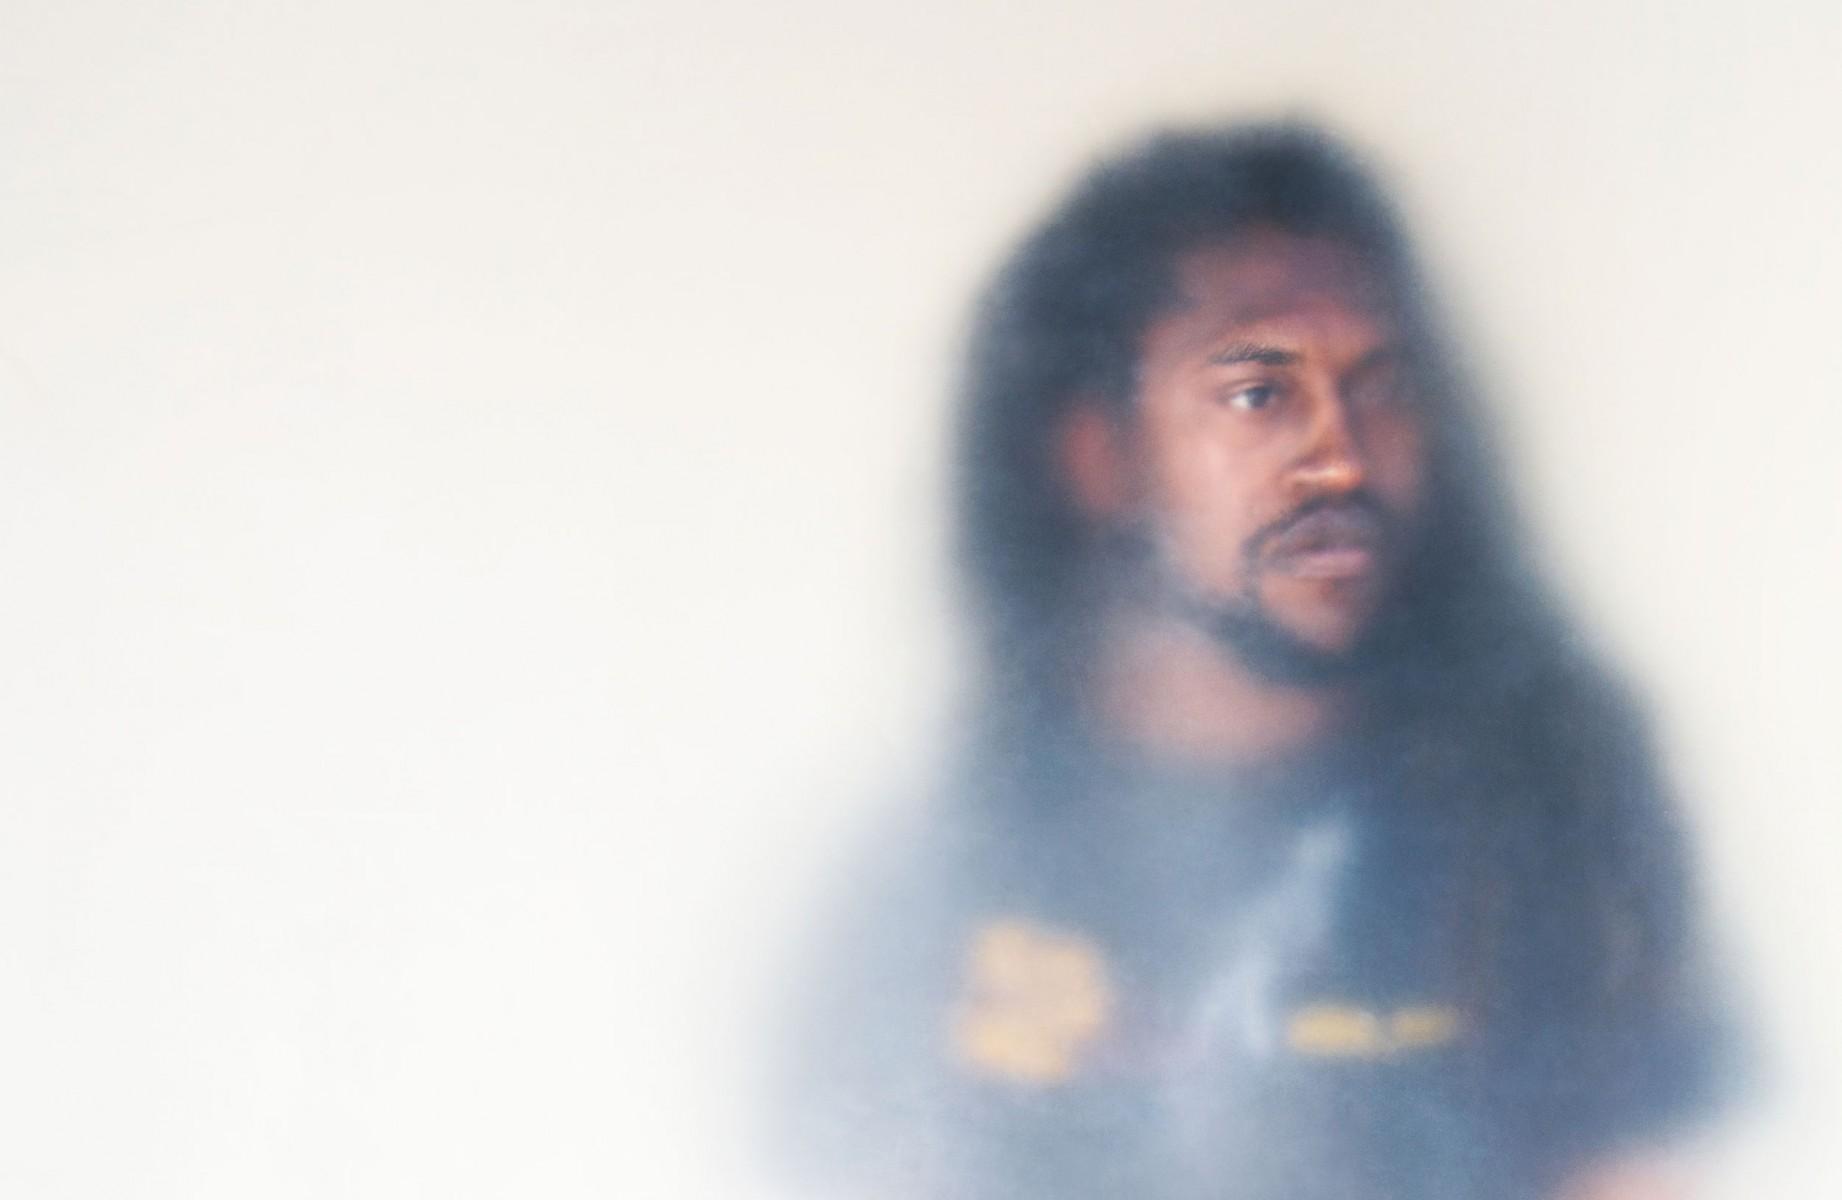 A man with long black hair